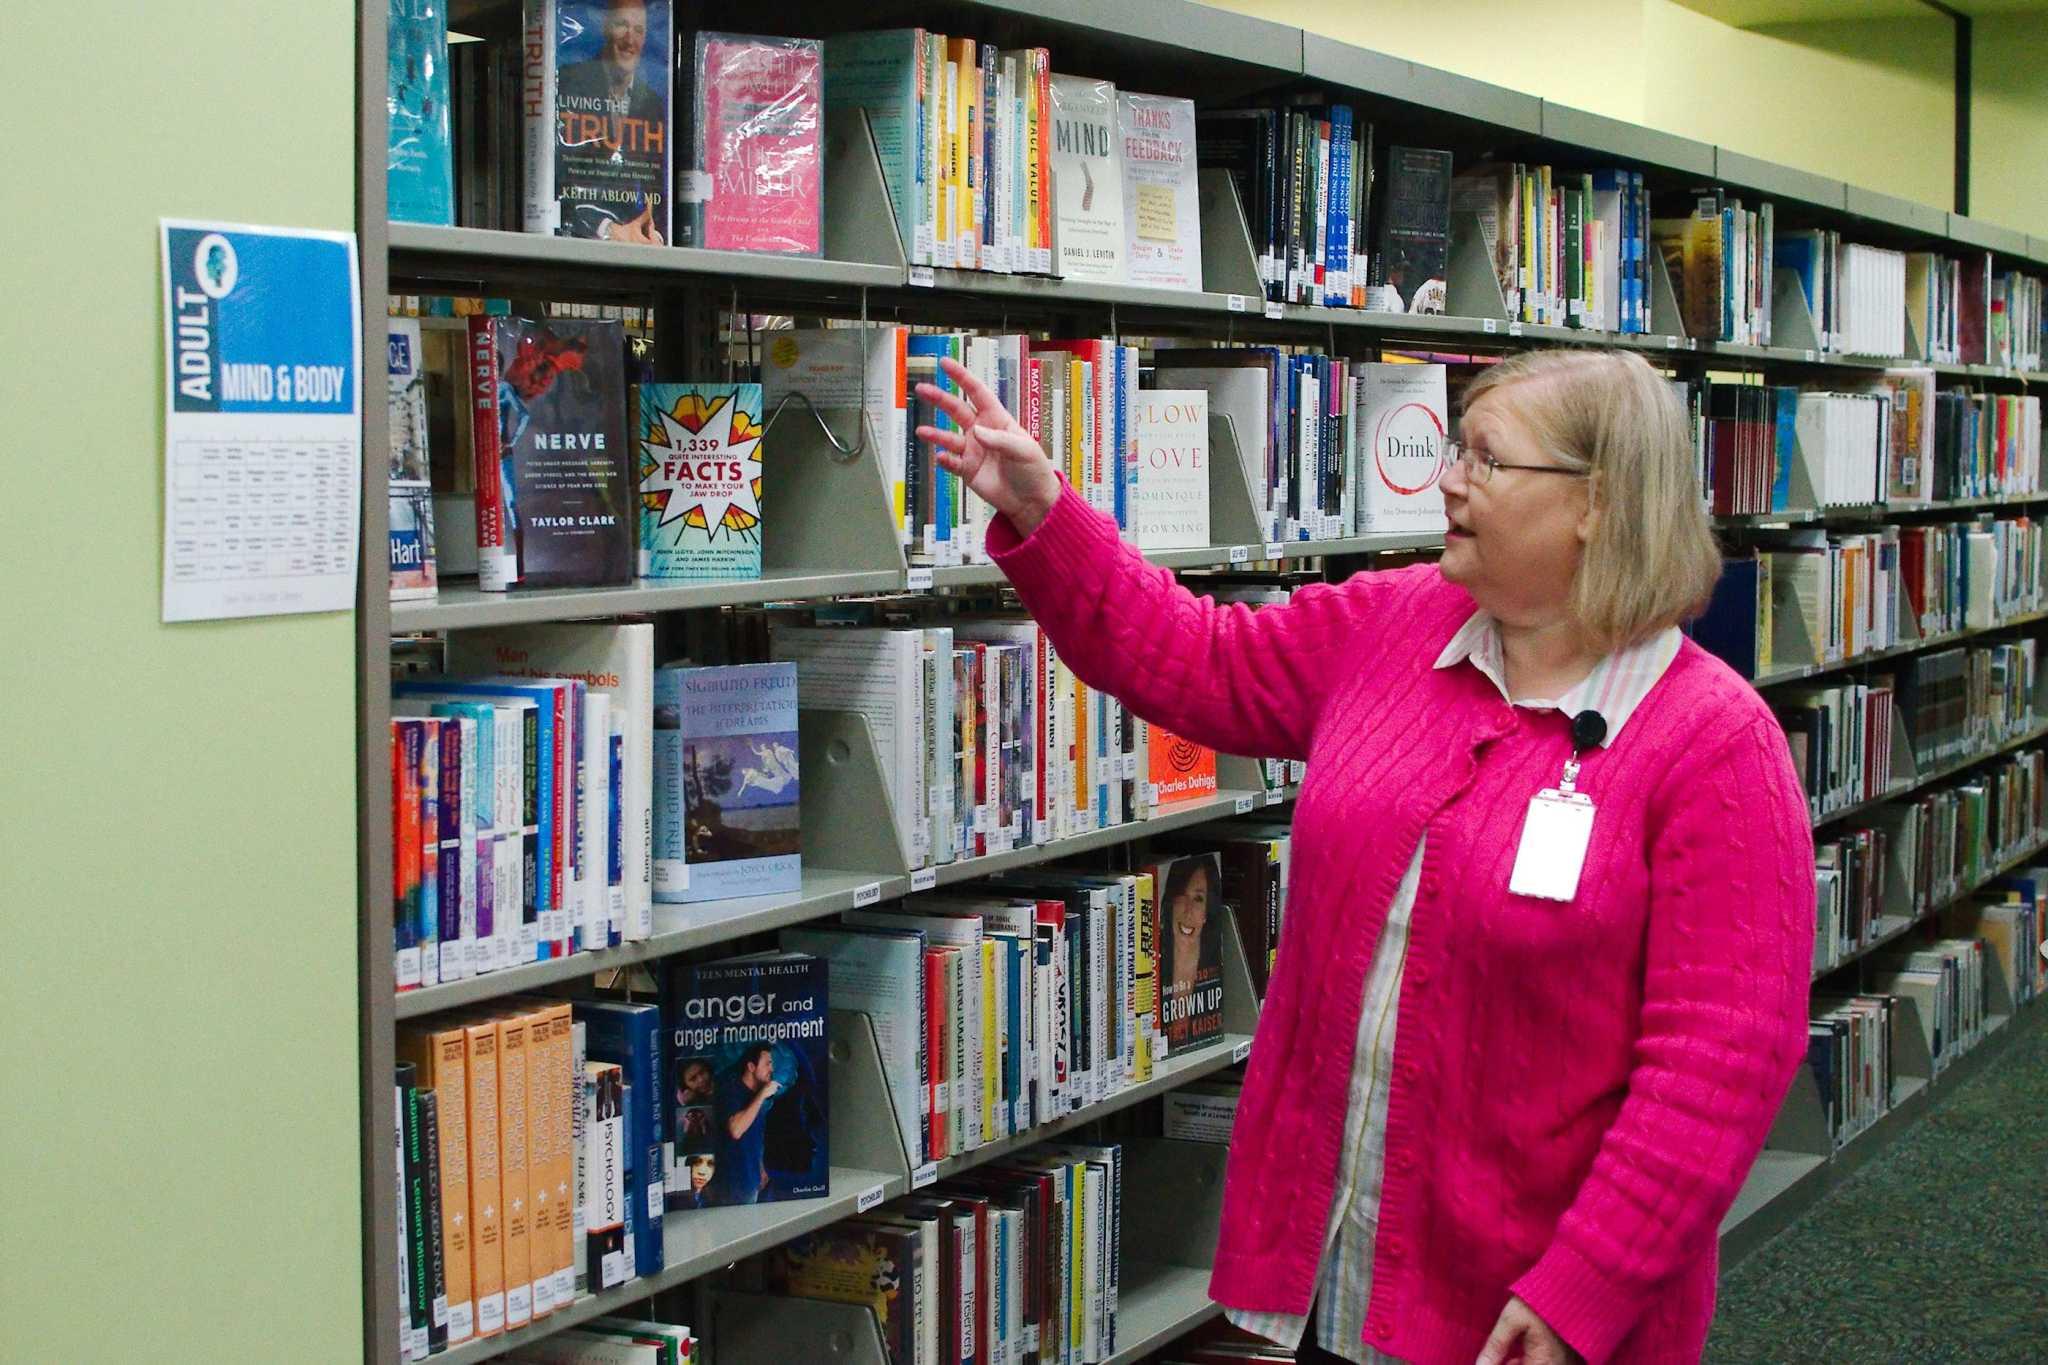 No More 640 38 Deer Park Library Tosses Dewey Decimal